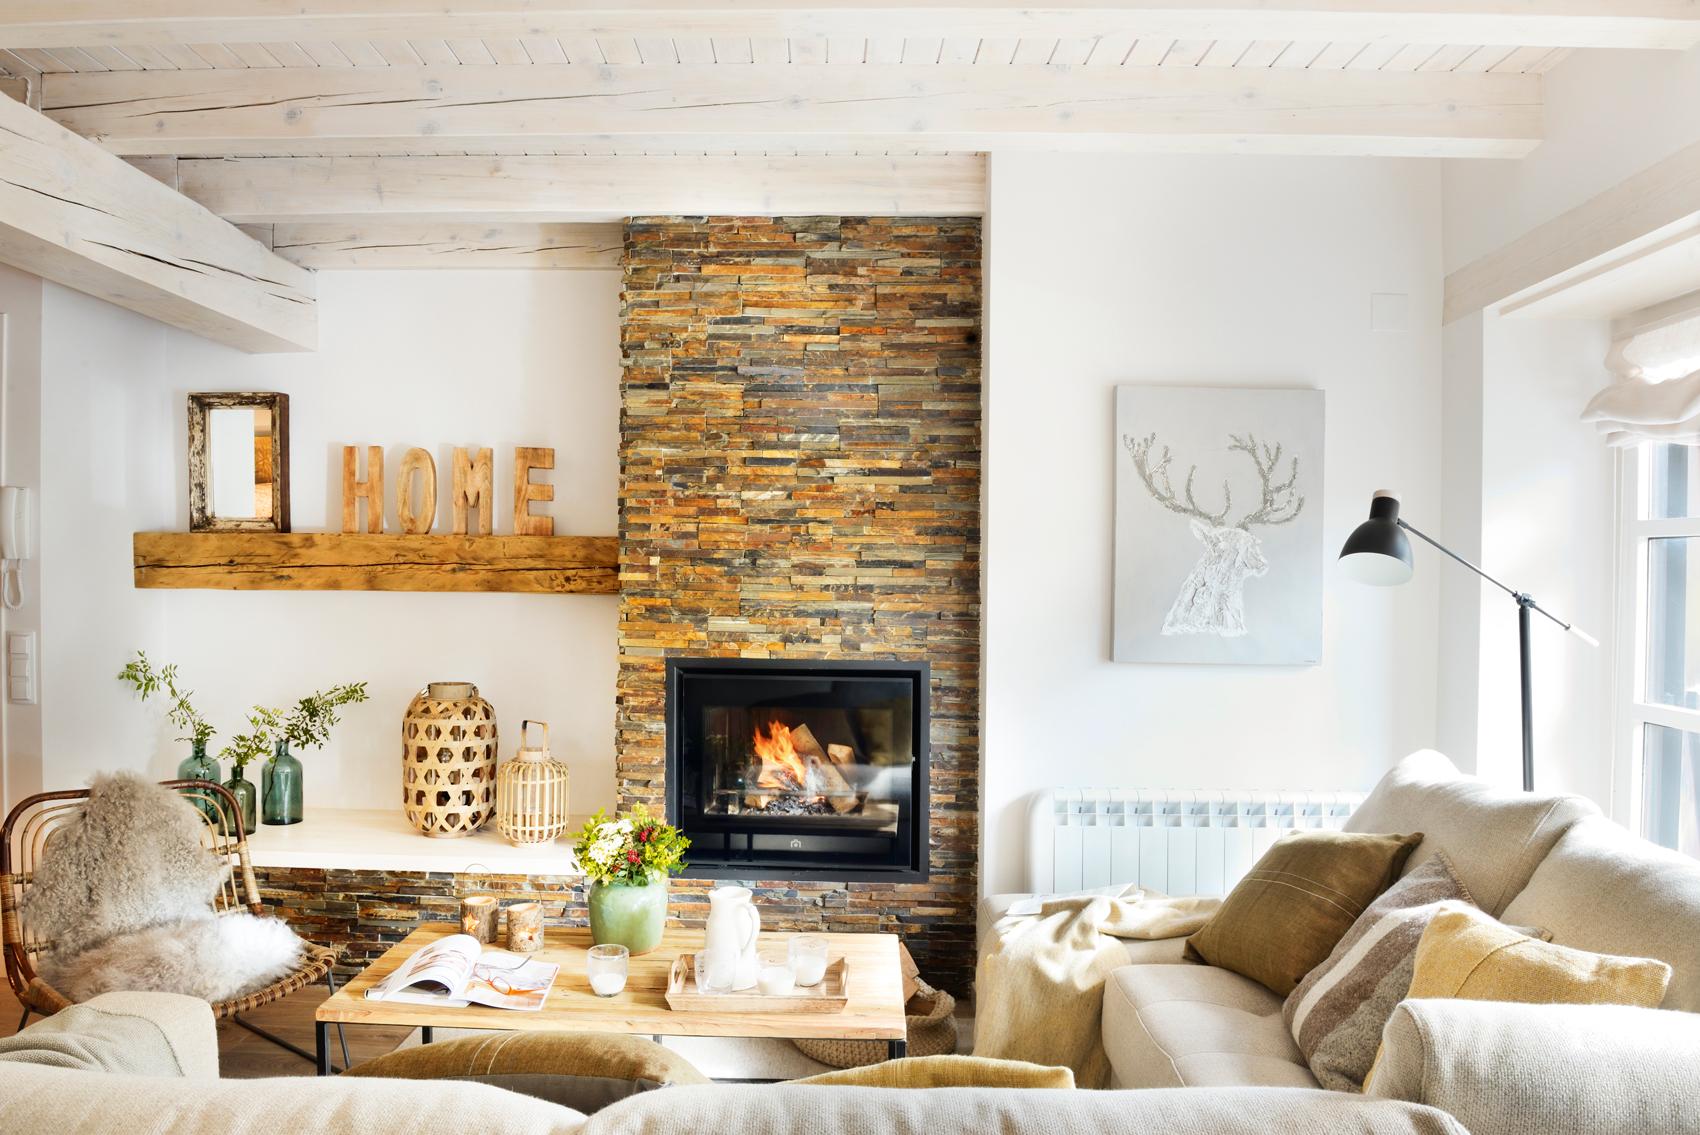 Salones peque os con muebles que aprovechan cada cent metro for Decoracion rustica contemporanea